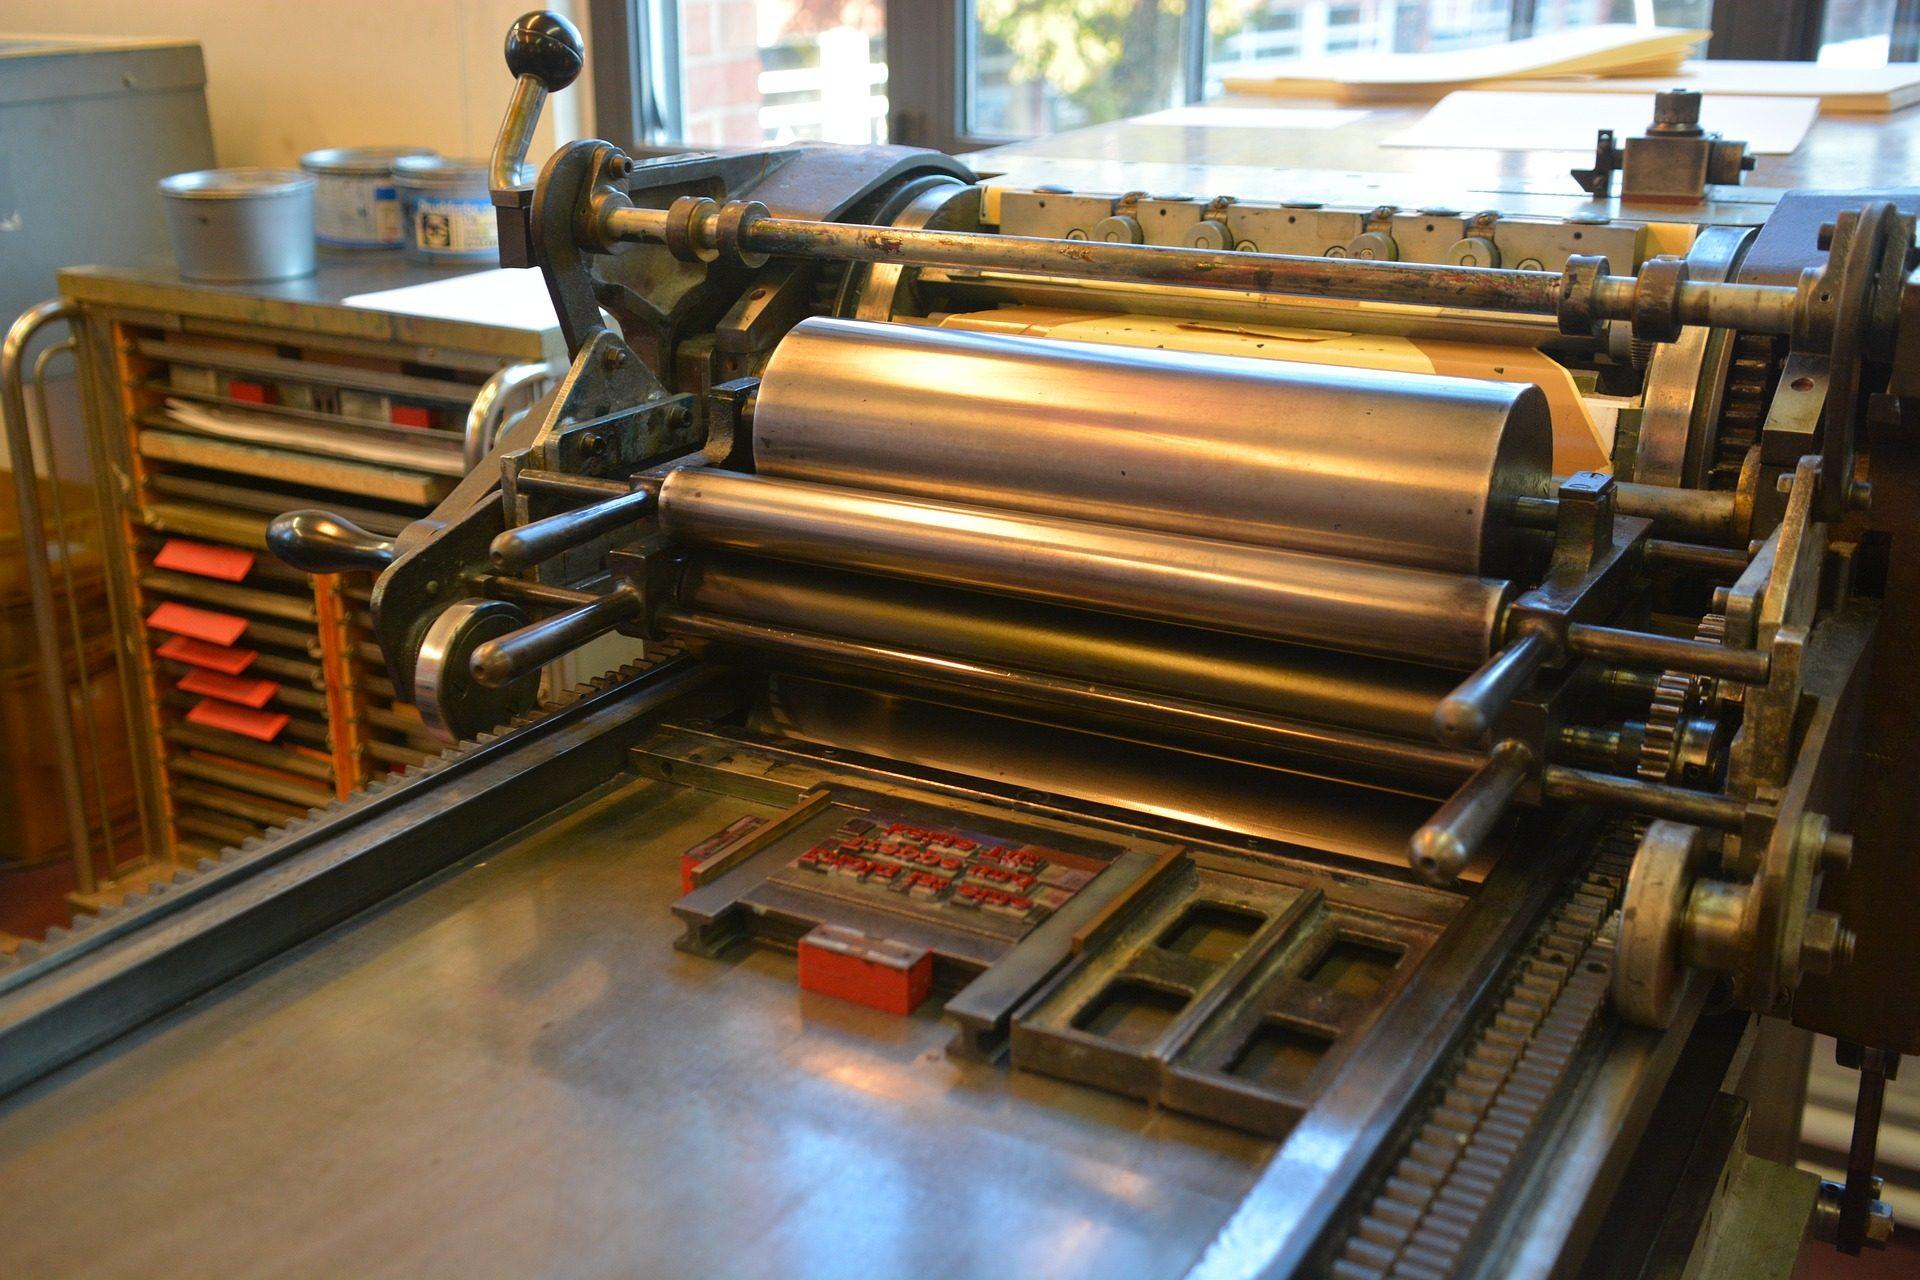 imprenta, a rulli, istampa tinta, vecchio, vintage - Sfondi HD - Professor-falken.com